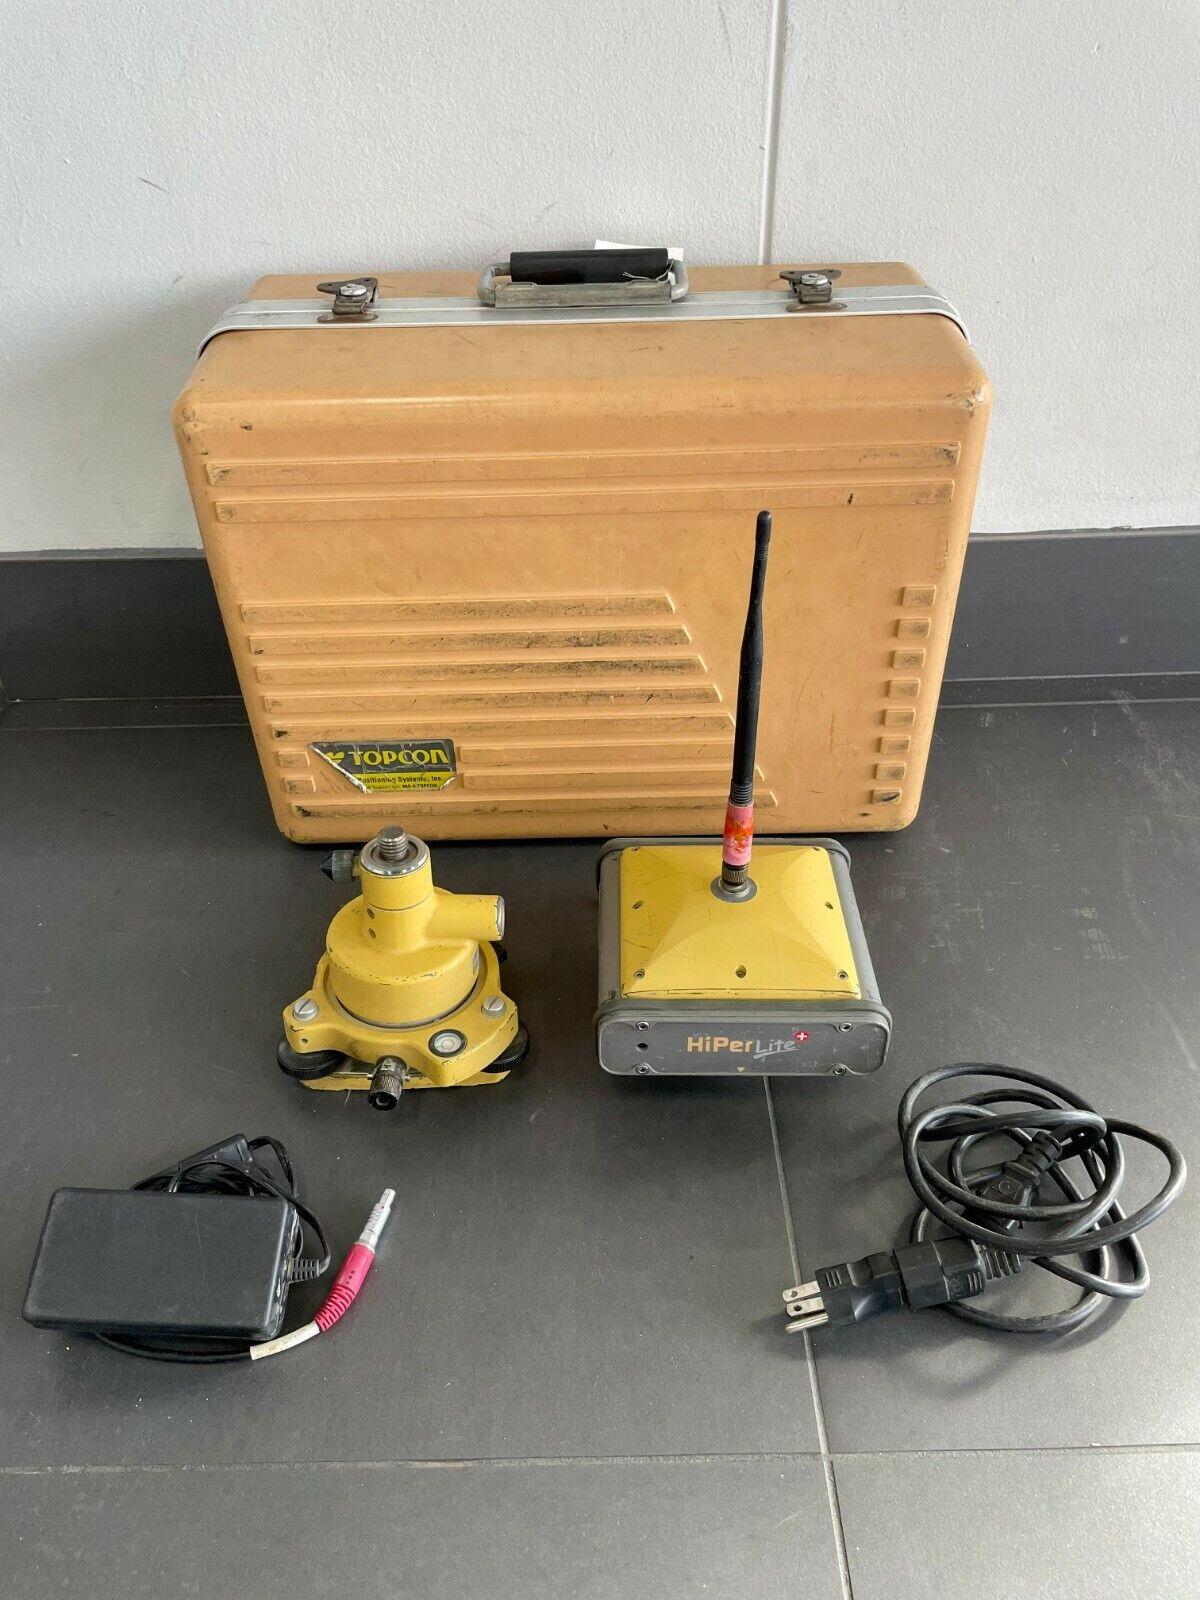 Topcon Hiper Lite Plus + GNSS GPS GLONASS Receiver P/N 01-840802-06 w/ extras